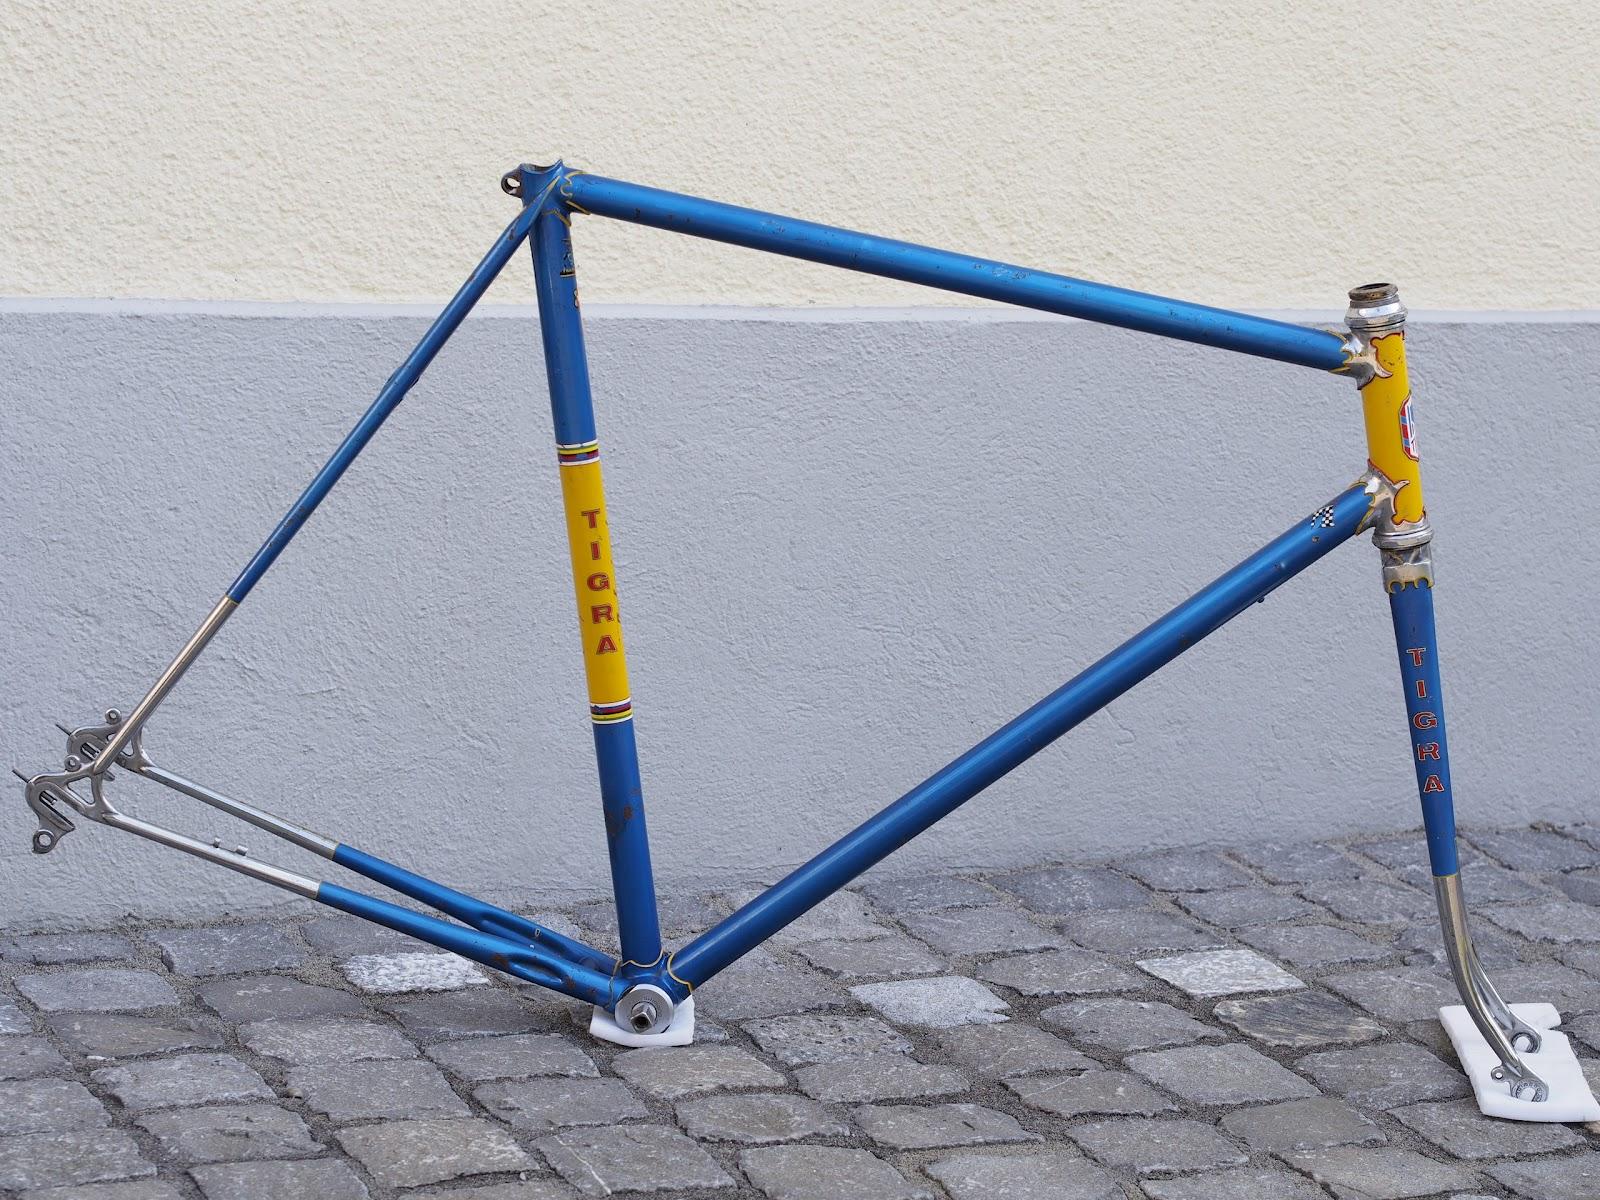 Zugzwang: Tour de France? 60s / 70s Tigra Professionnel-Rahmen mit ...